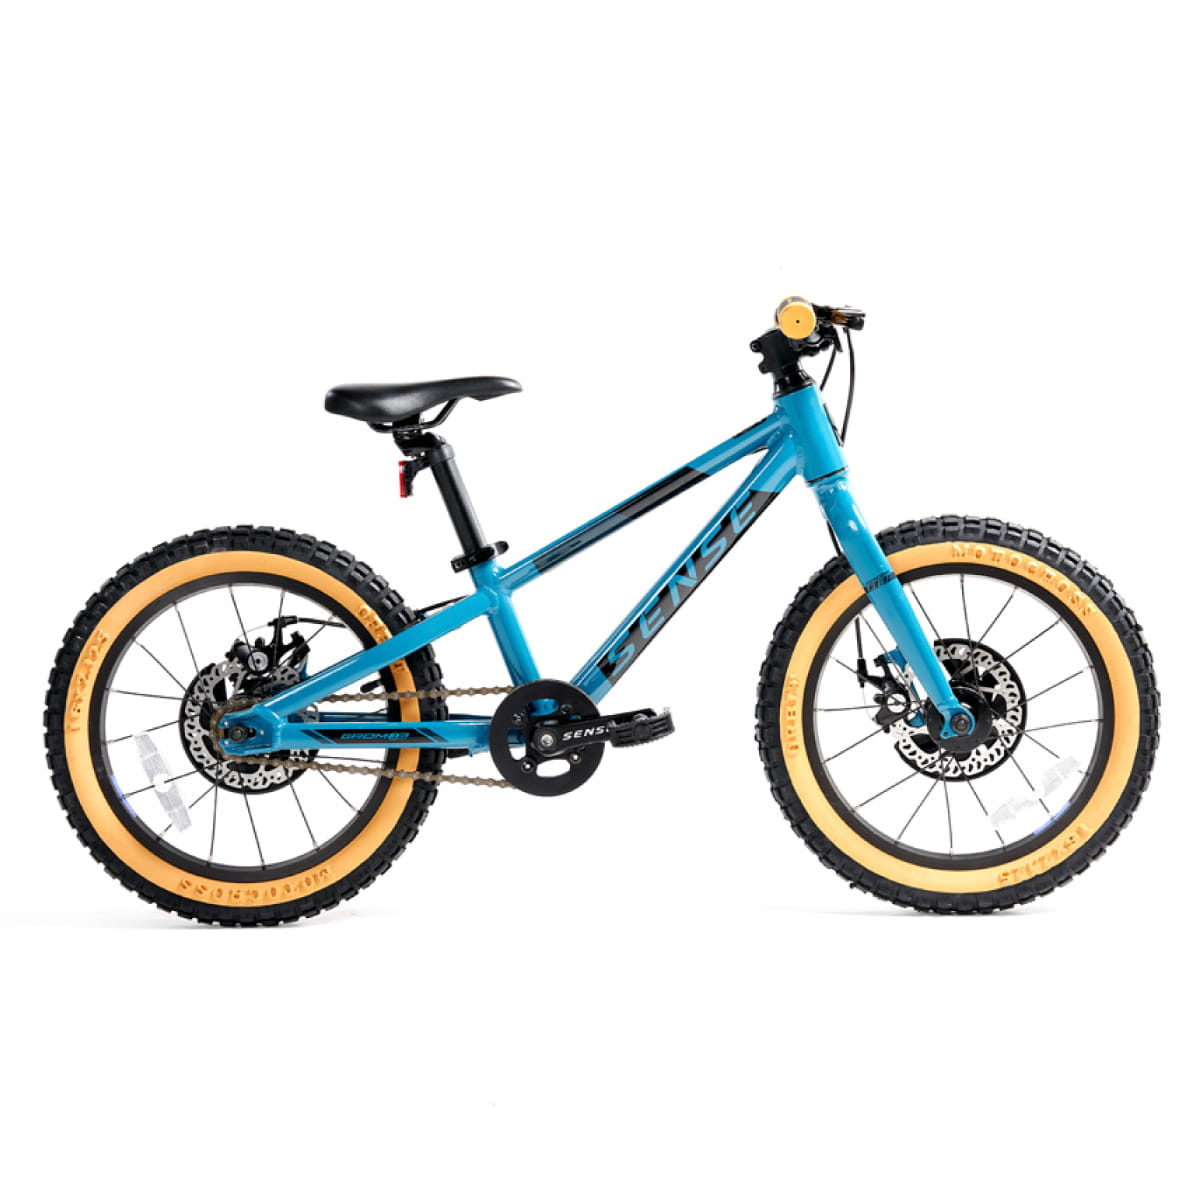 Bike Sense Grom 2021 Aro 16 Aqua Preto